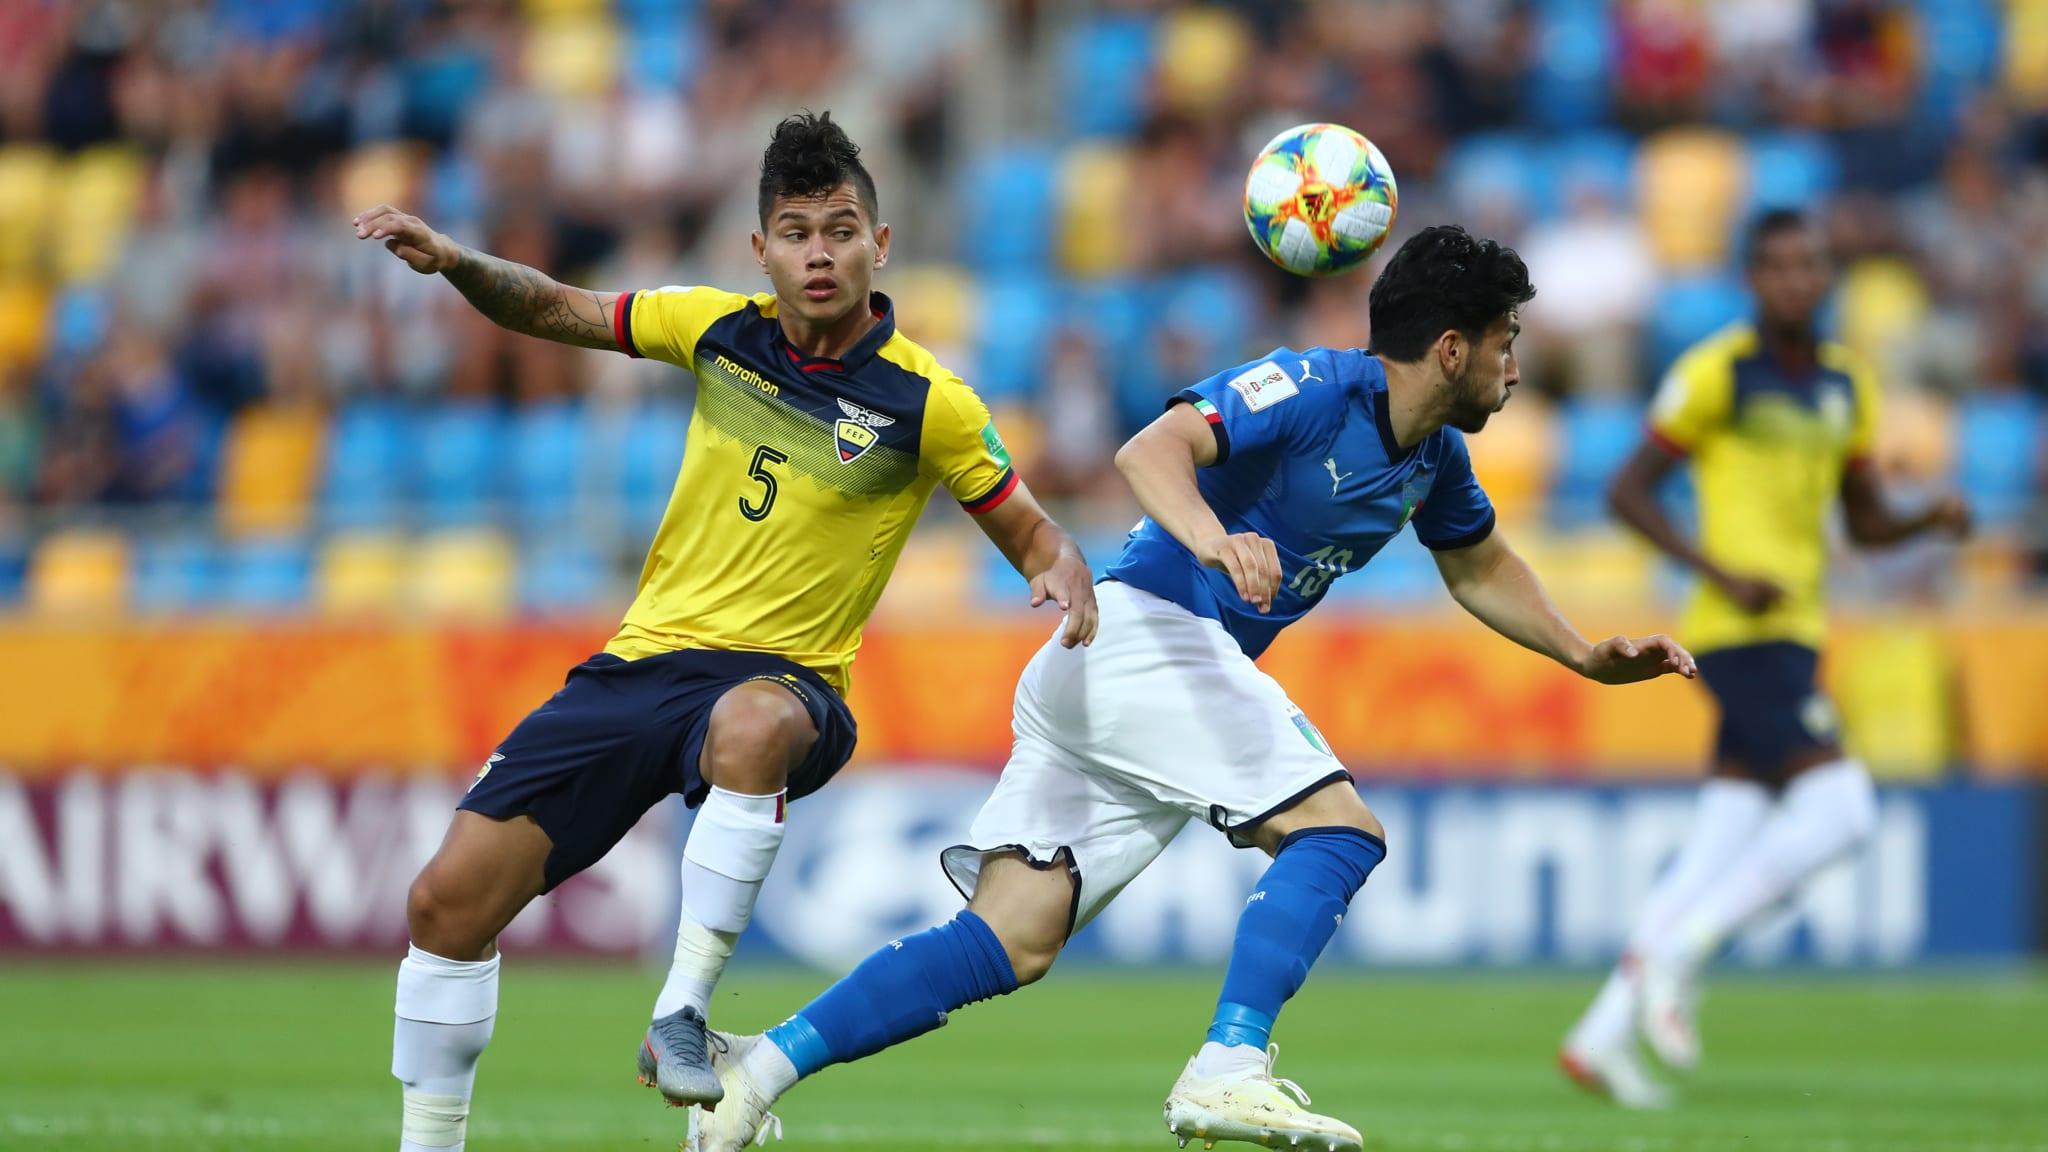 Jordy Alcivar of Ecuador battles for possession with Roberto Alberico of Italy